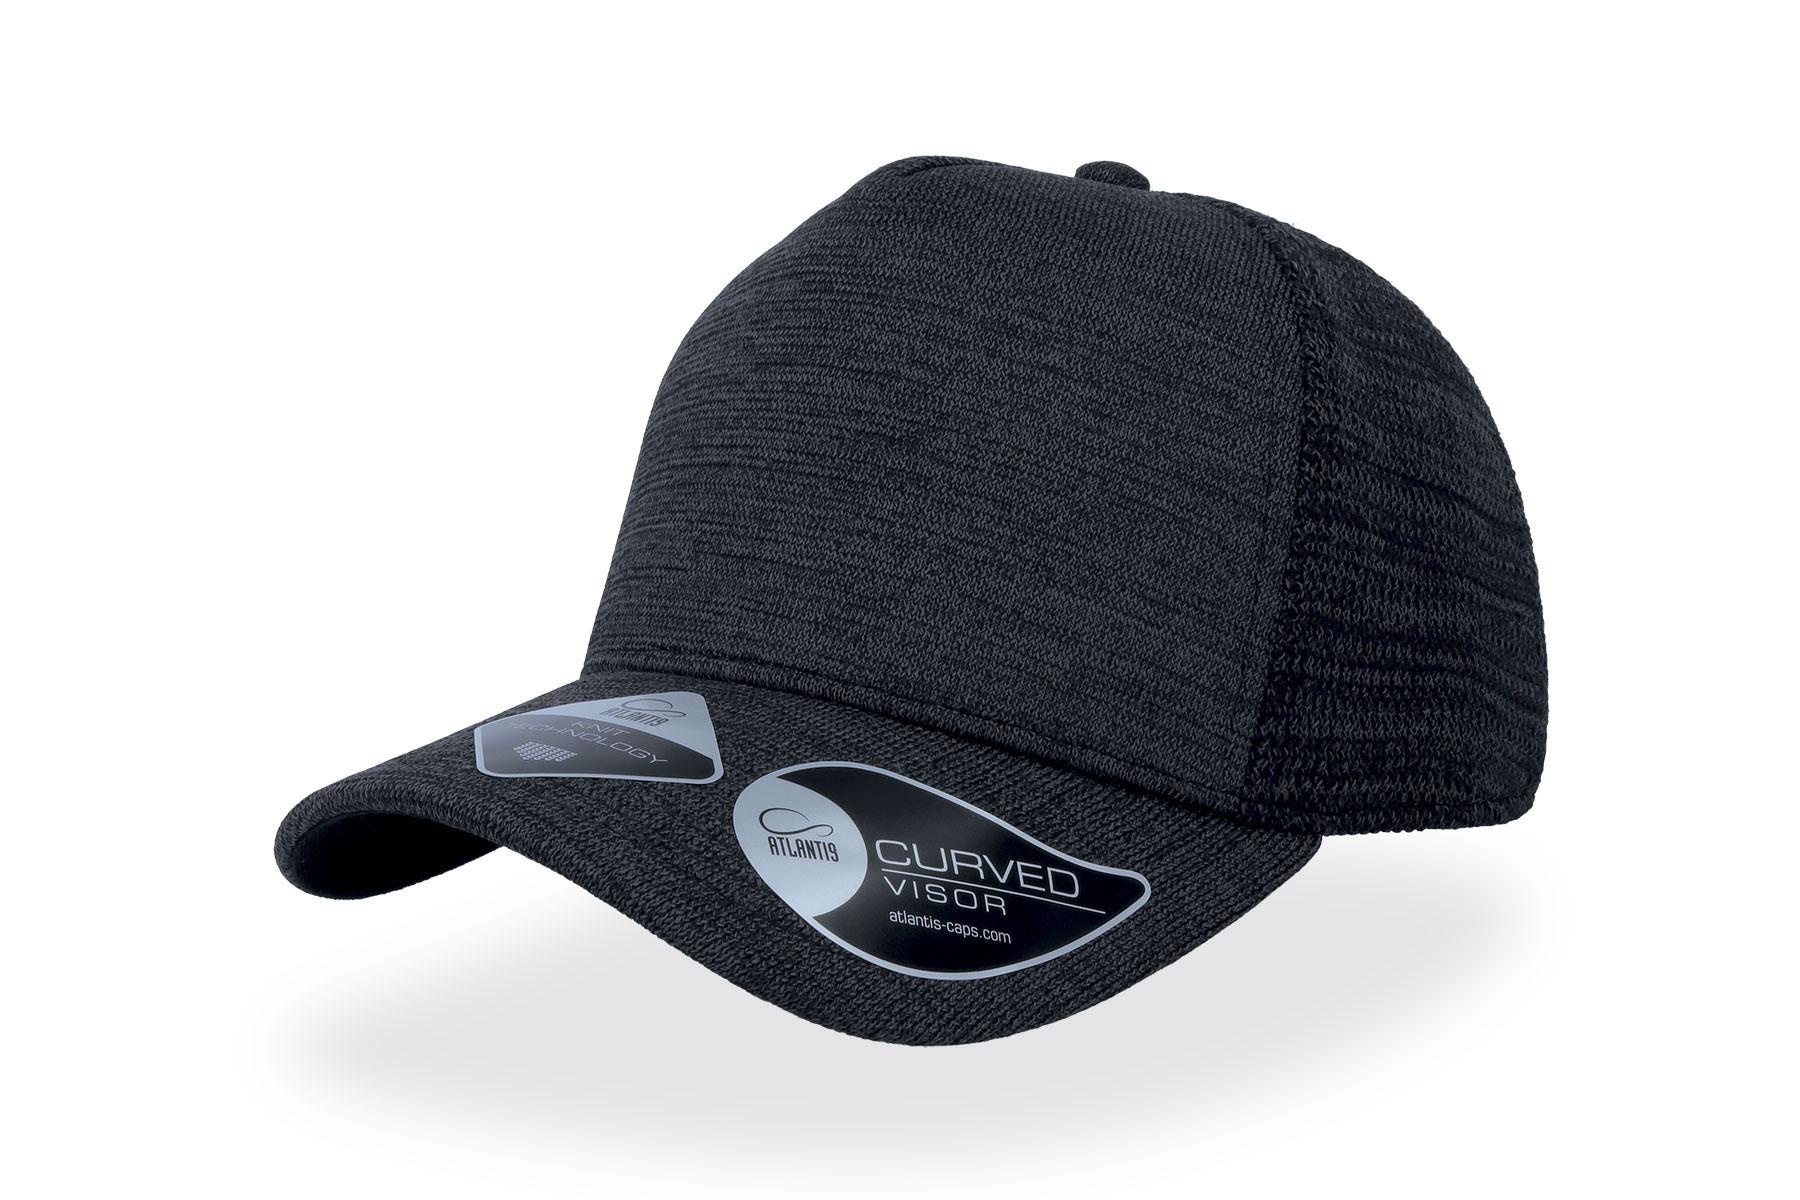 Knit lippis - NEW 2019 ATLANTIS CAPS & HATS - KNIC - 2